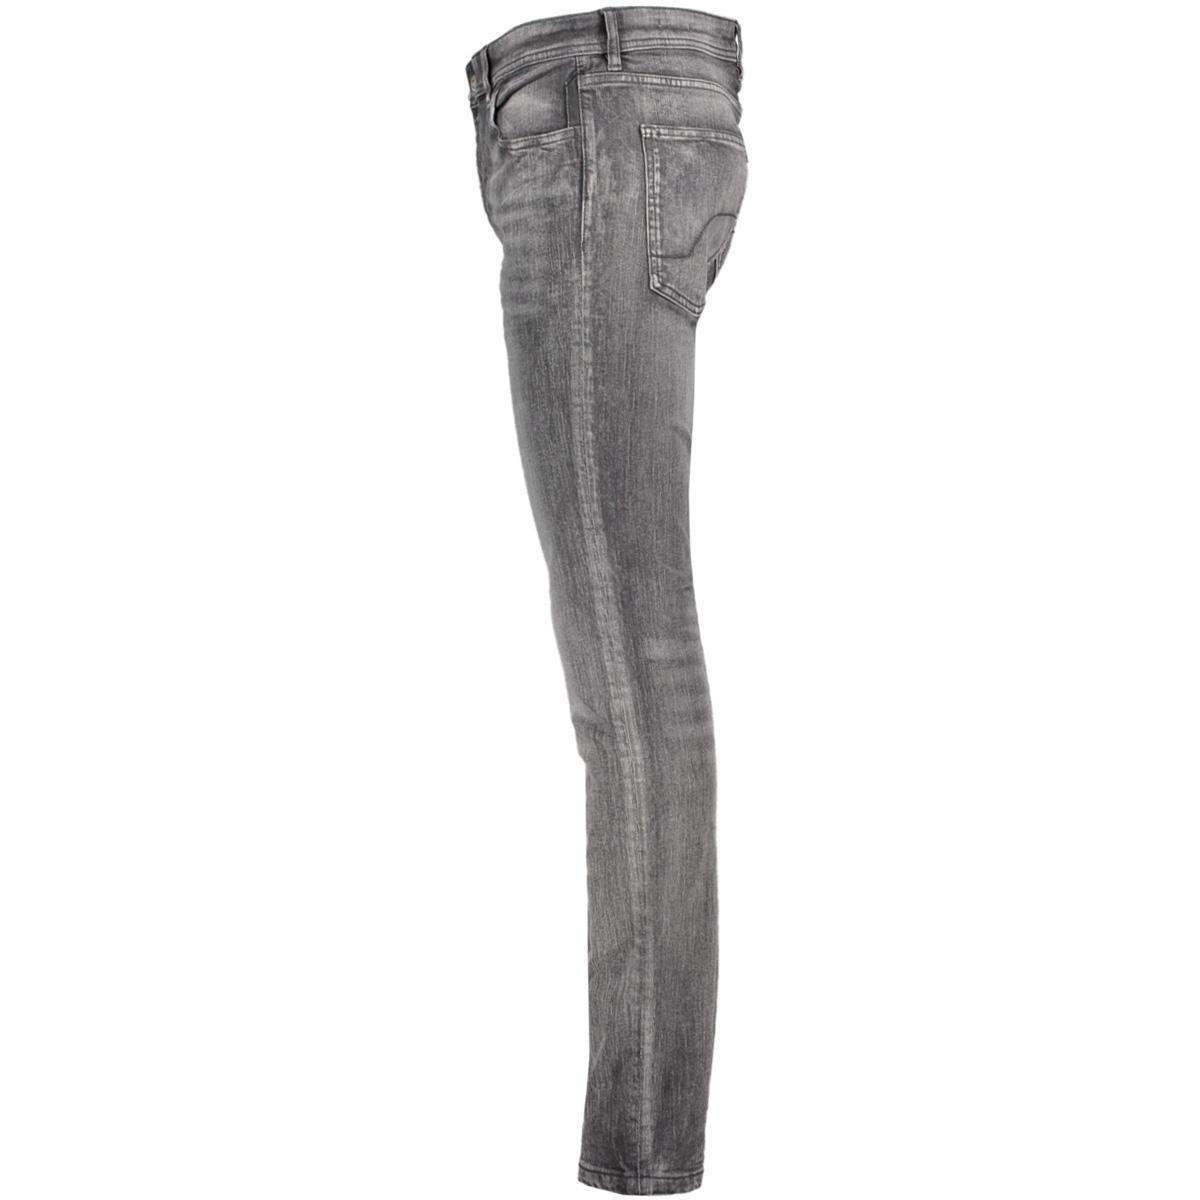 088cc2b008 edc jeans c922